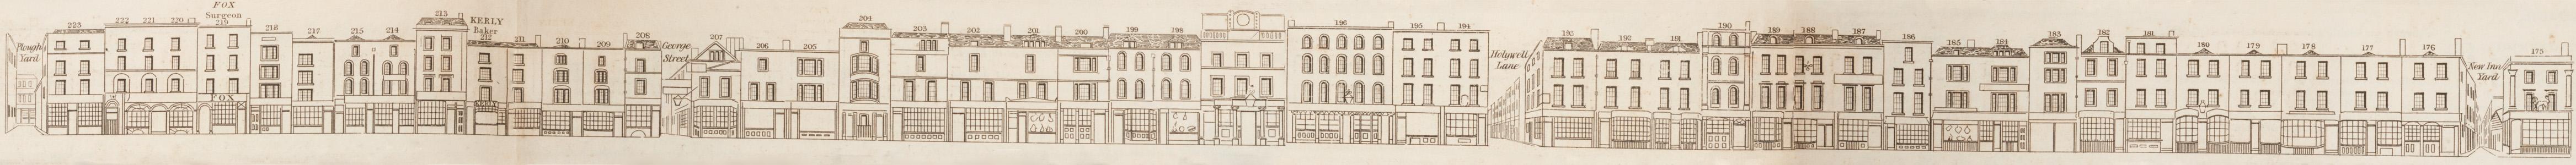 map - Tallis's London street views : No. 59. Shoreditch, division 2 (west)